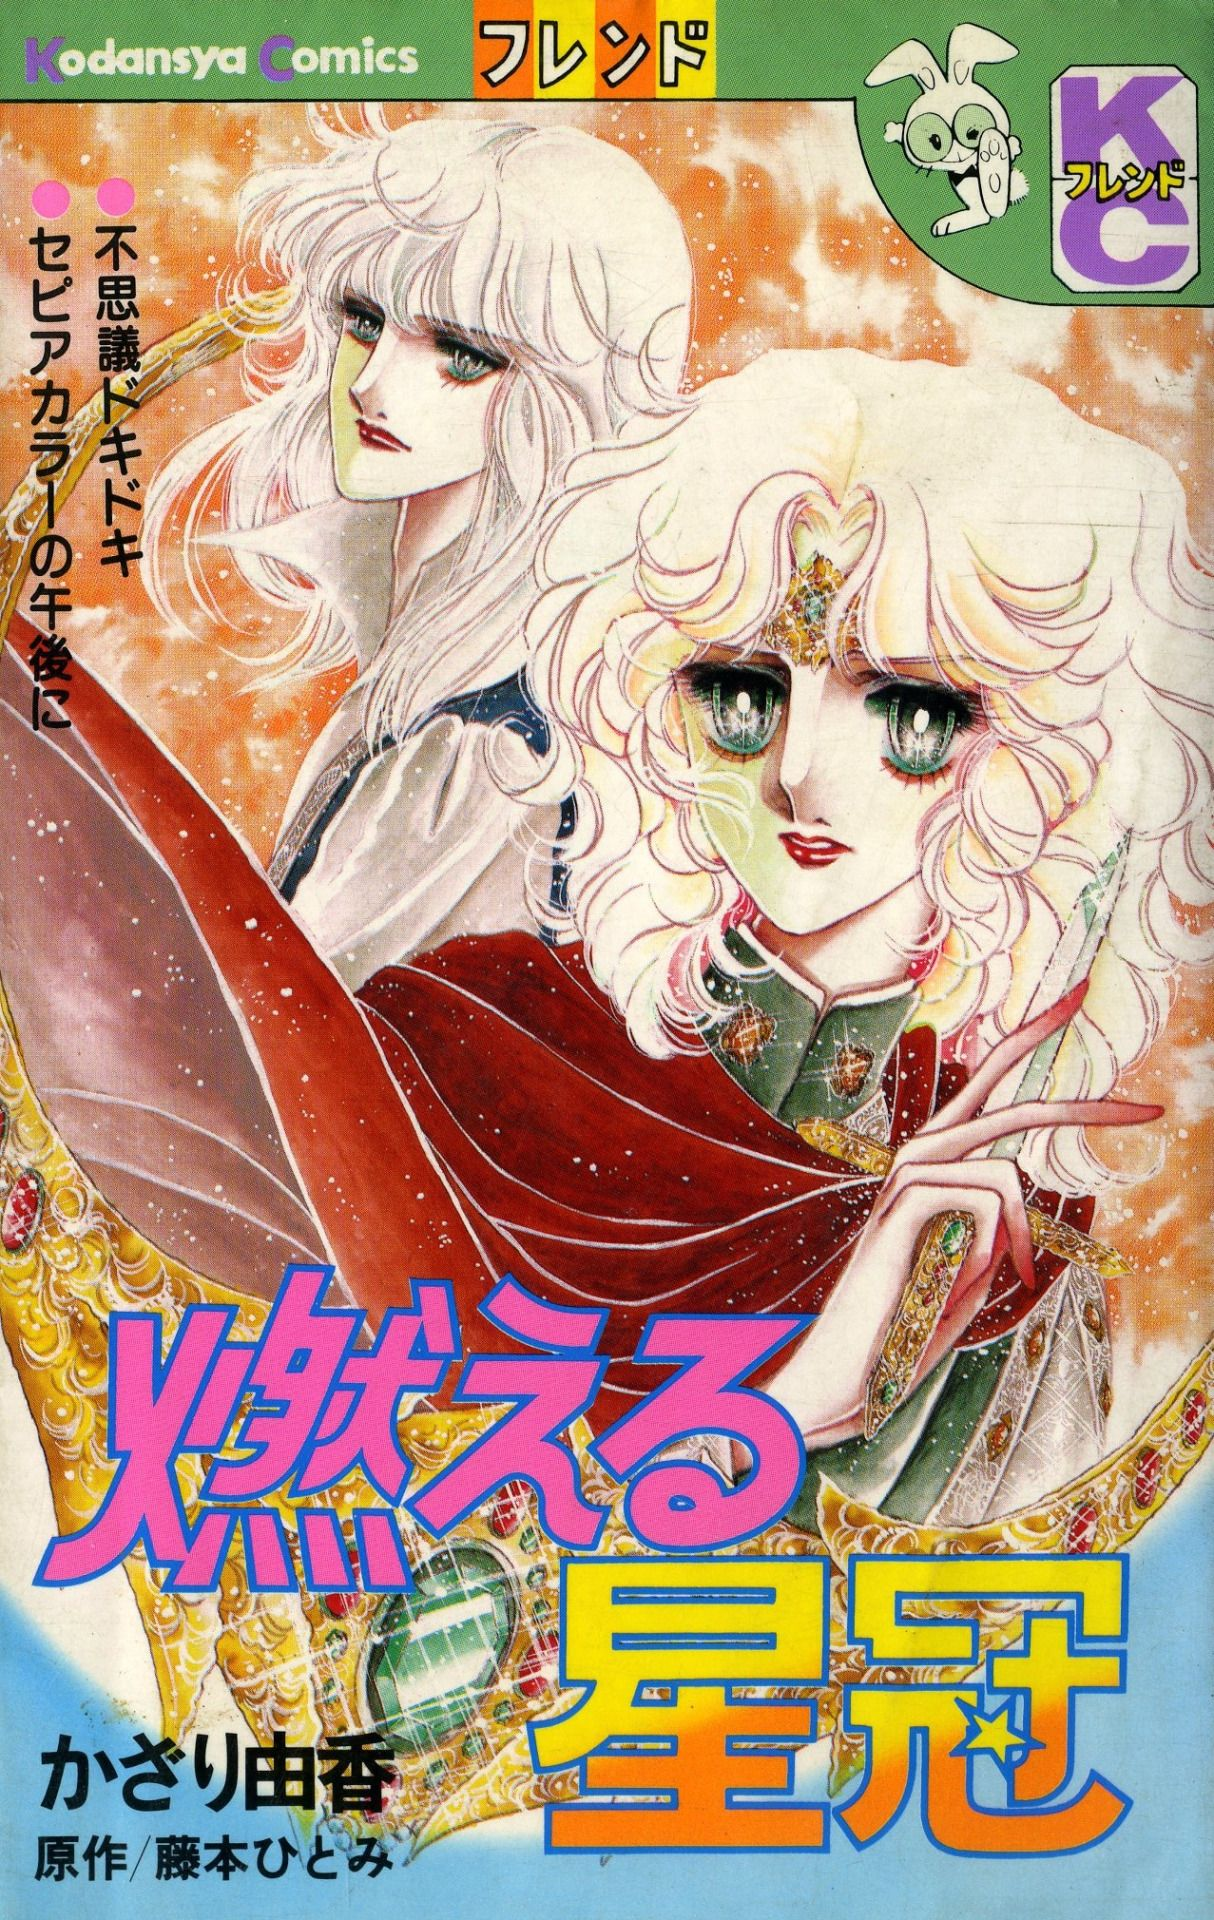 Art by Yuka Kazari かざり由香 History of manga, Retro art, Anime